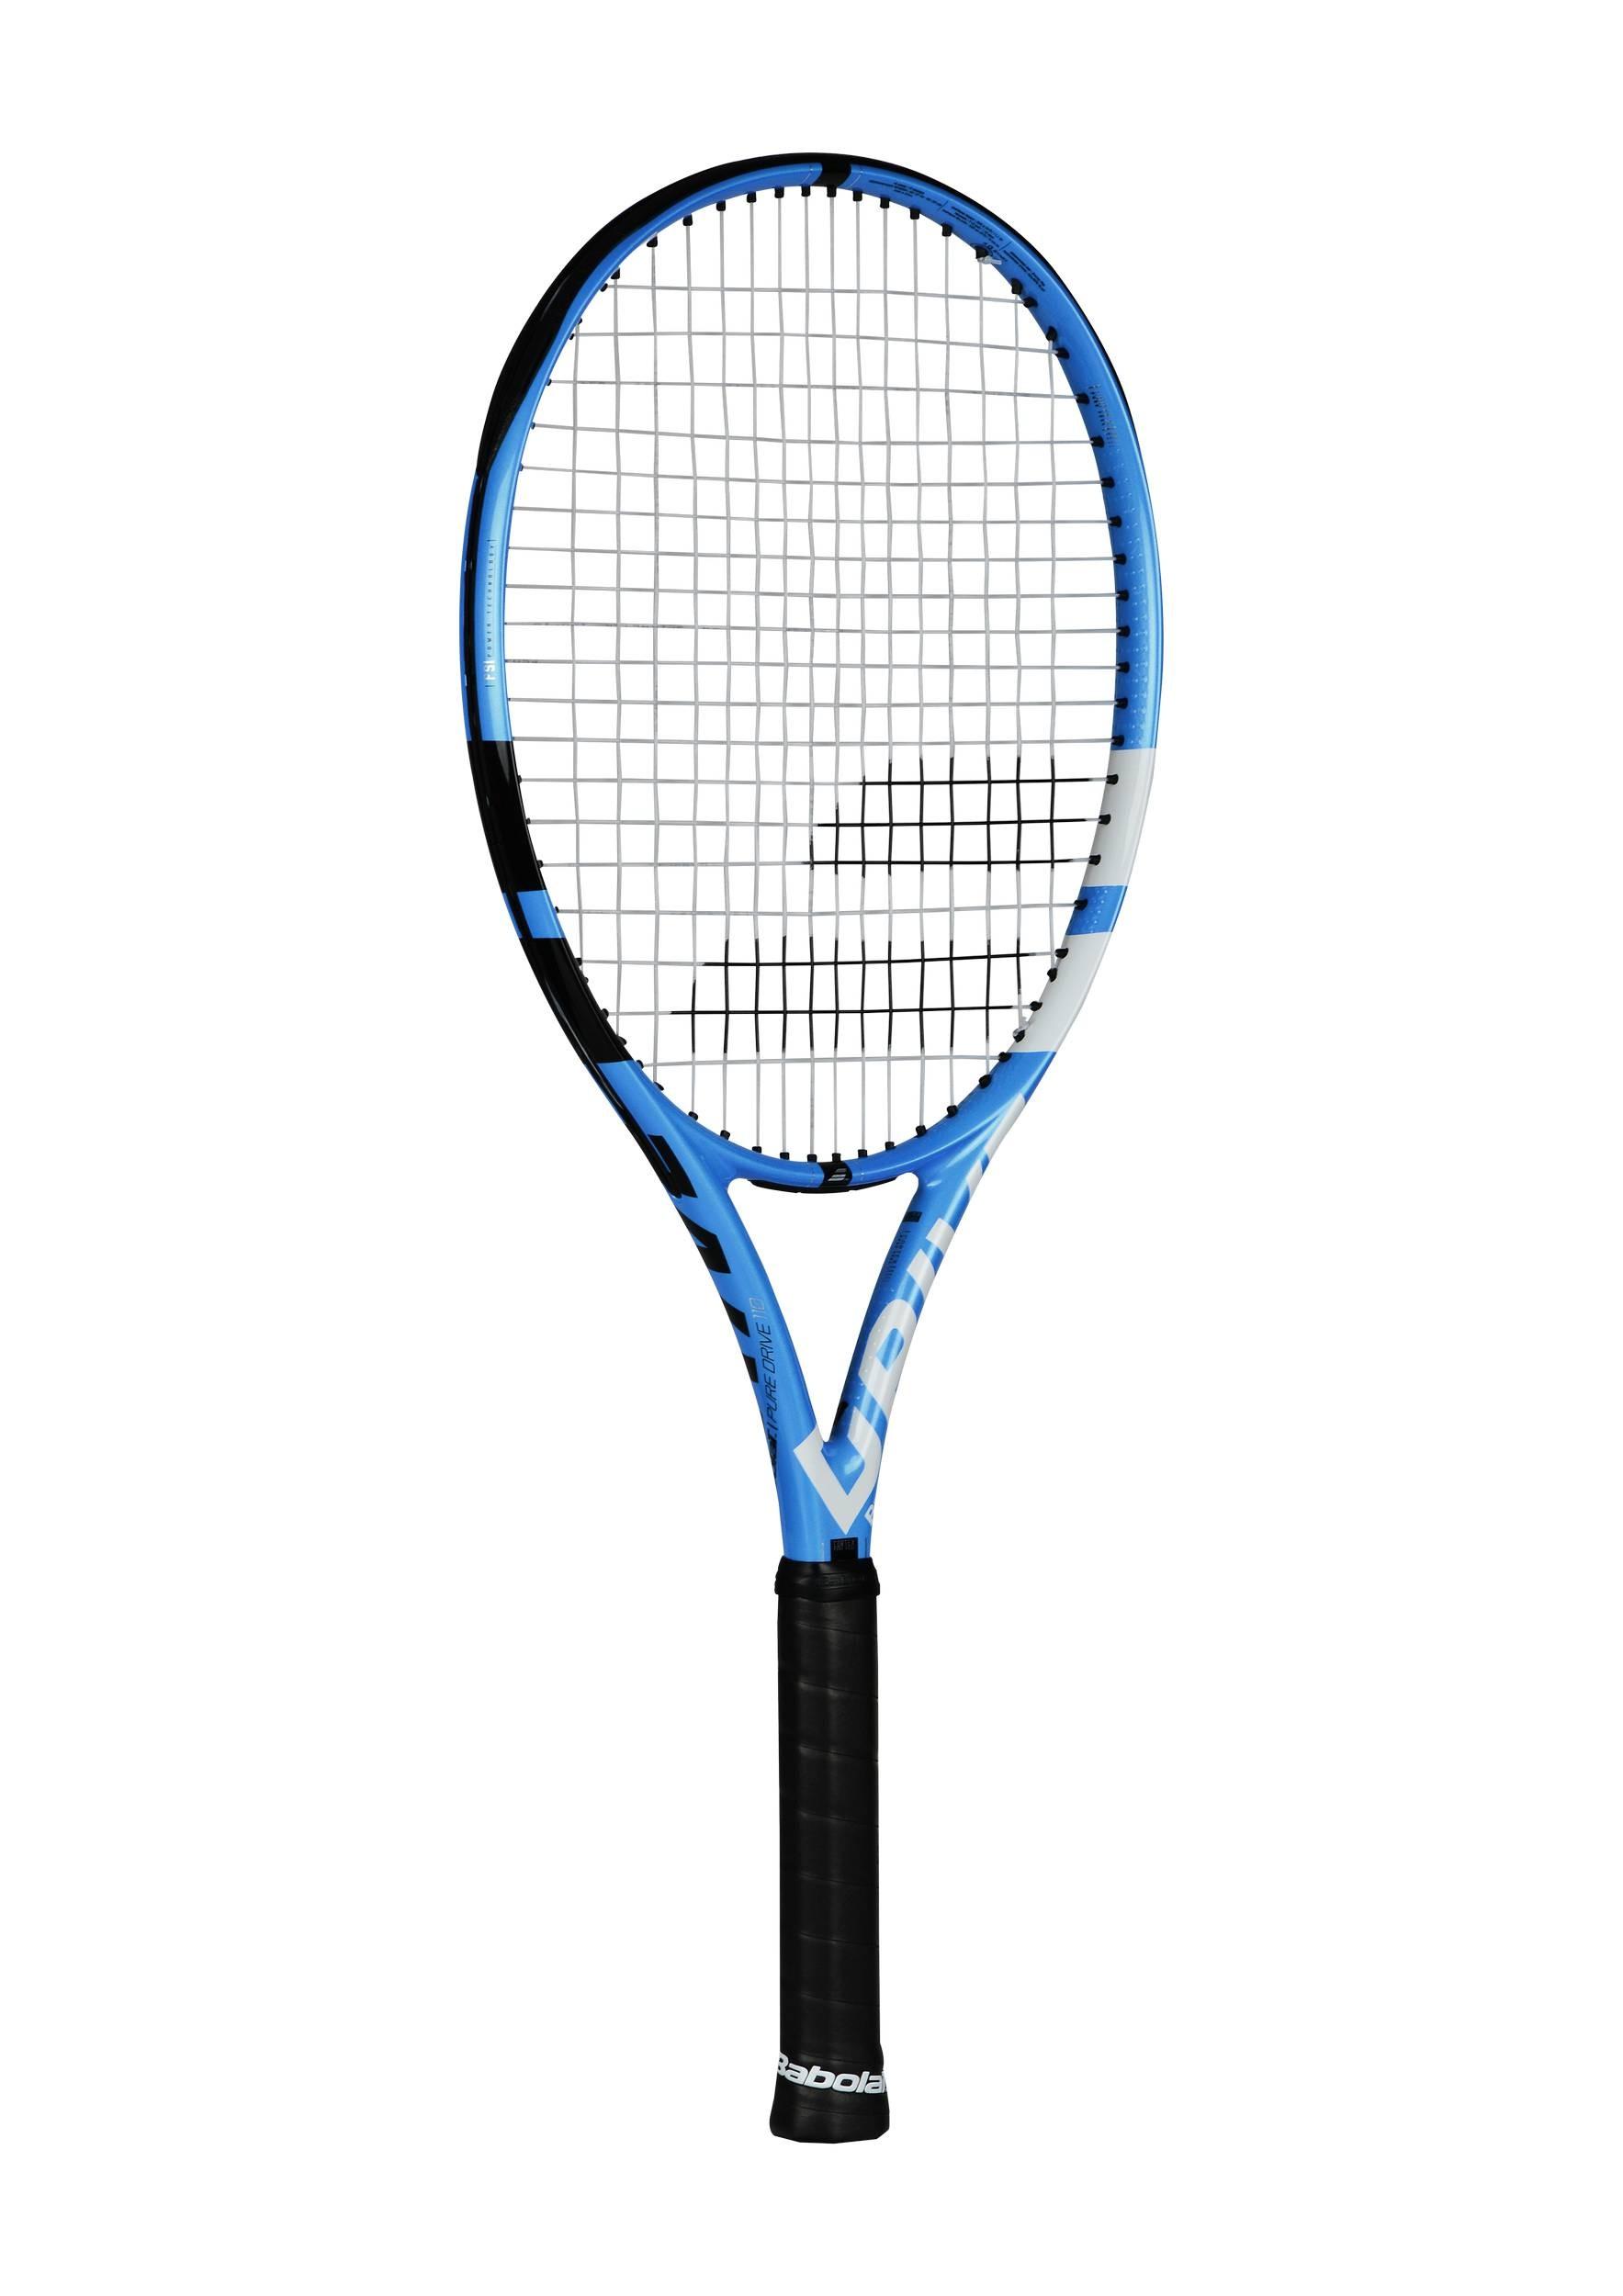 Rakieta tenisowa Babolat Pure Drive 110 2018 + Spiraltek + VS Grip